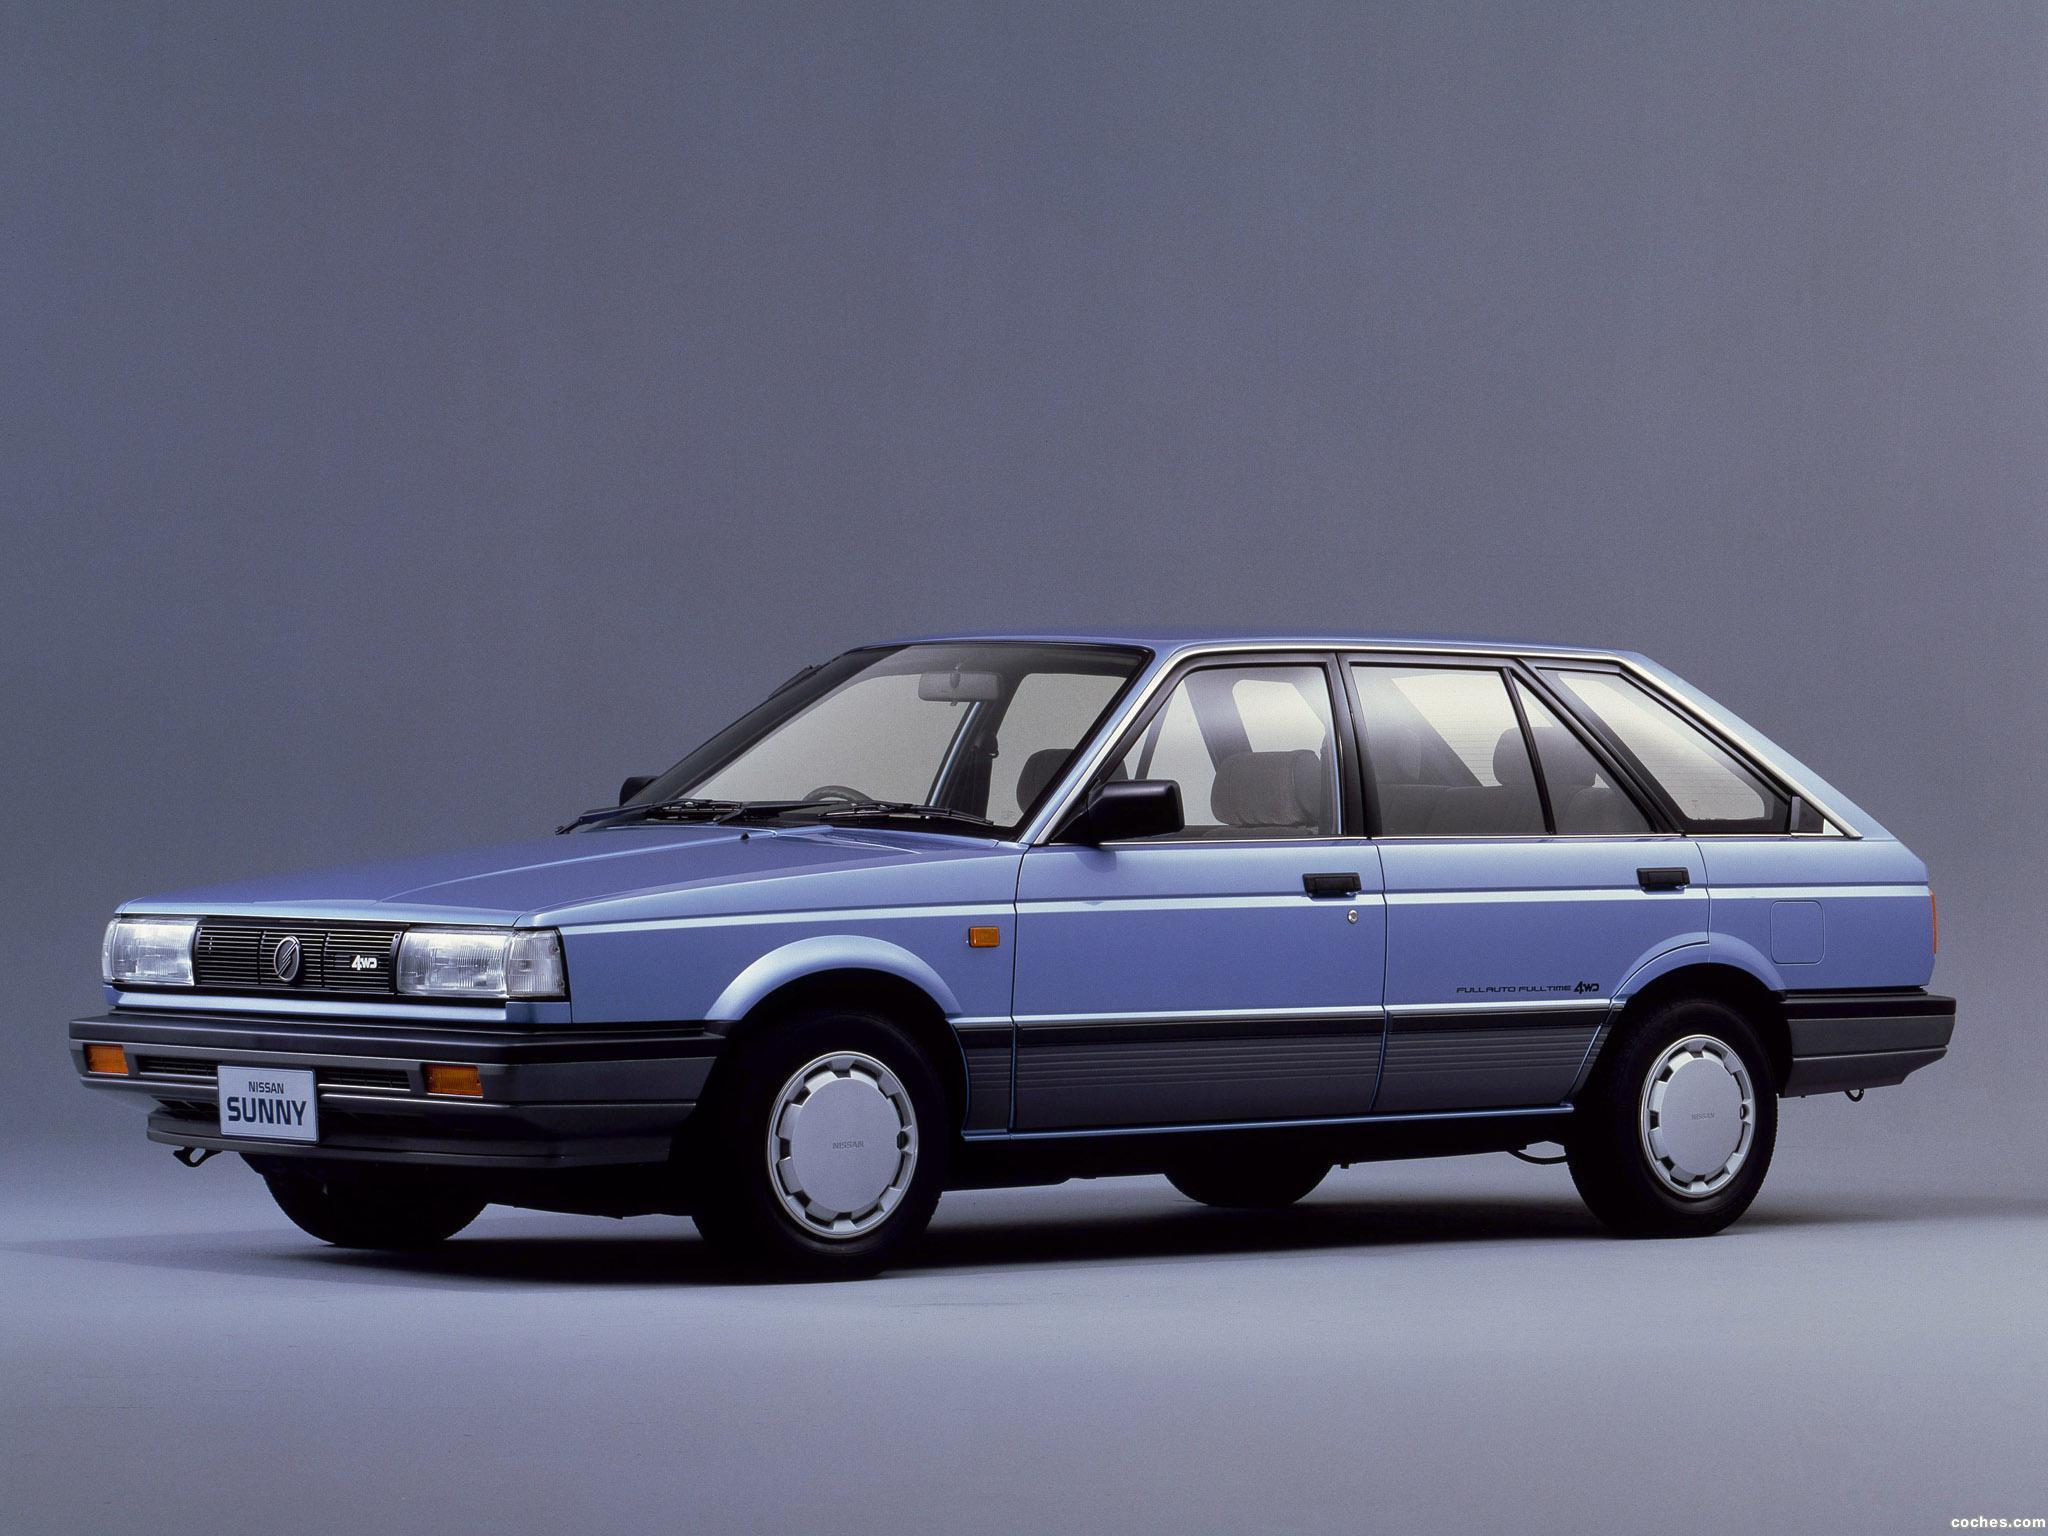 Fotos de Nissan Sunny California 4WD B12 1986